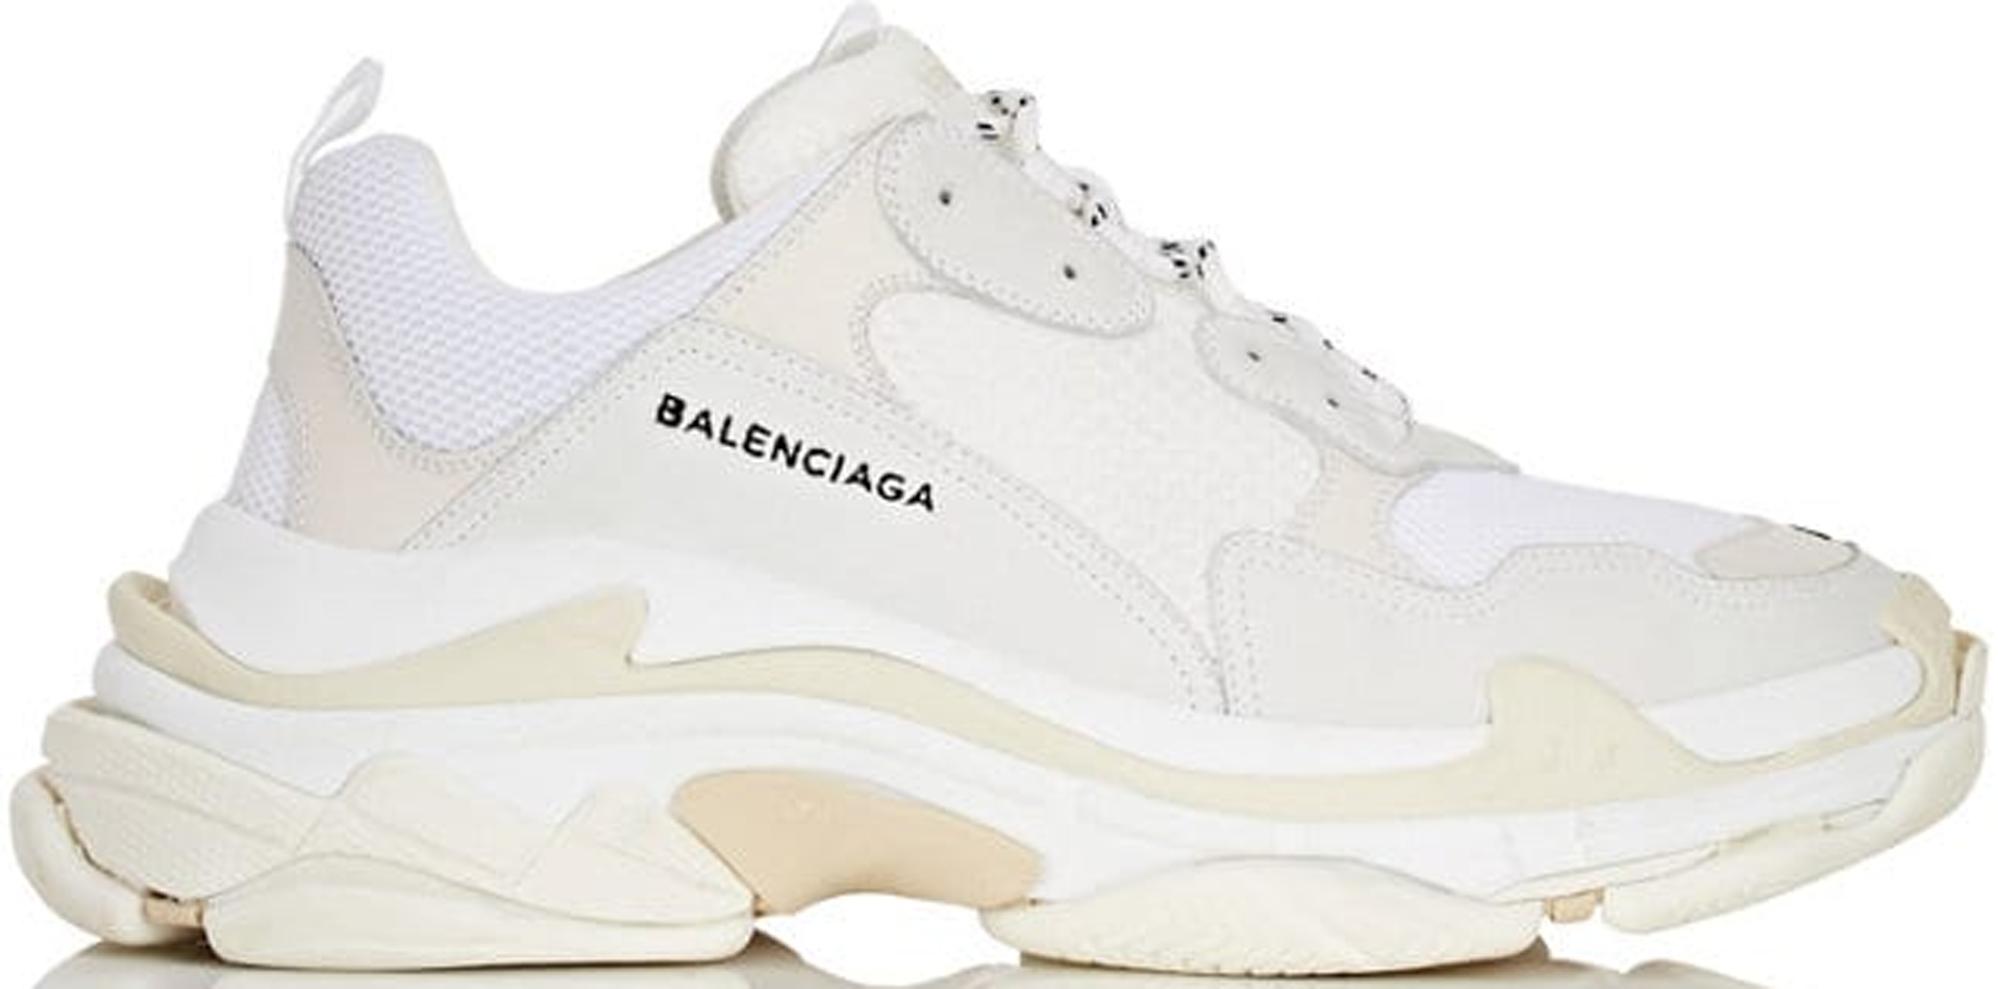 Balenciaga Trainers Triple S worn by Quavo on his